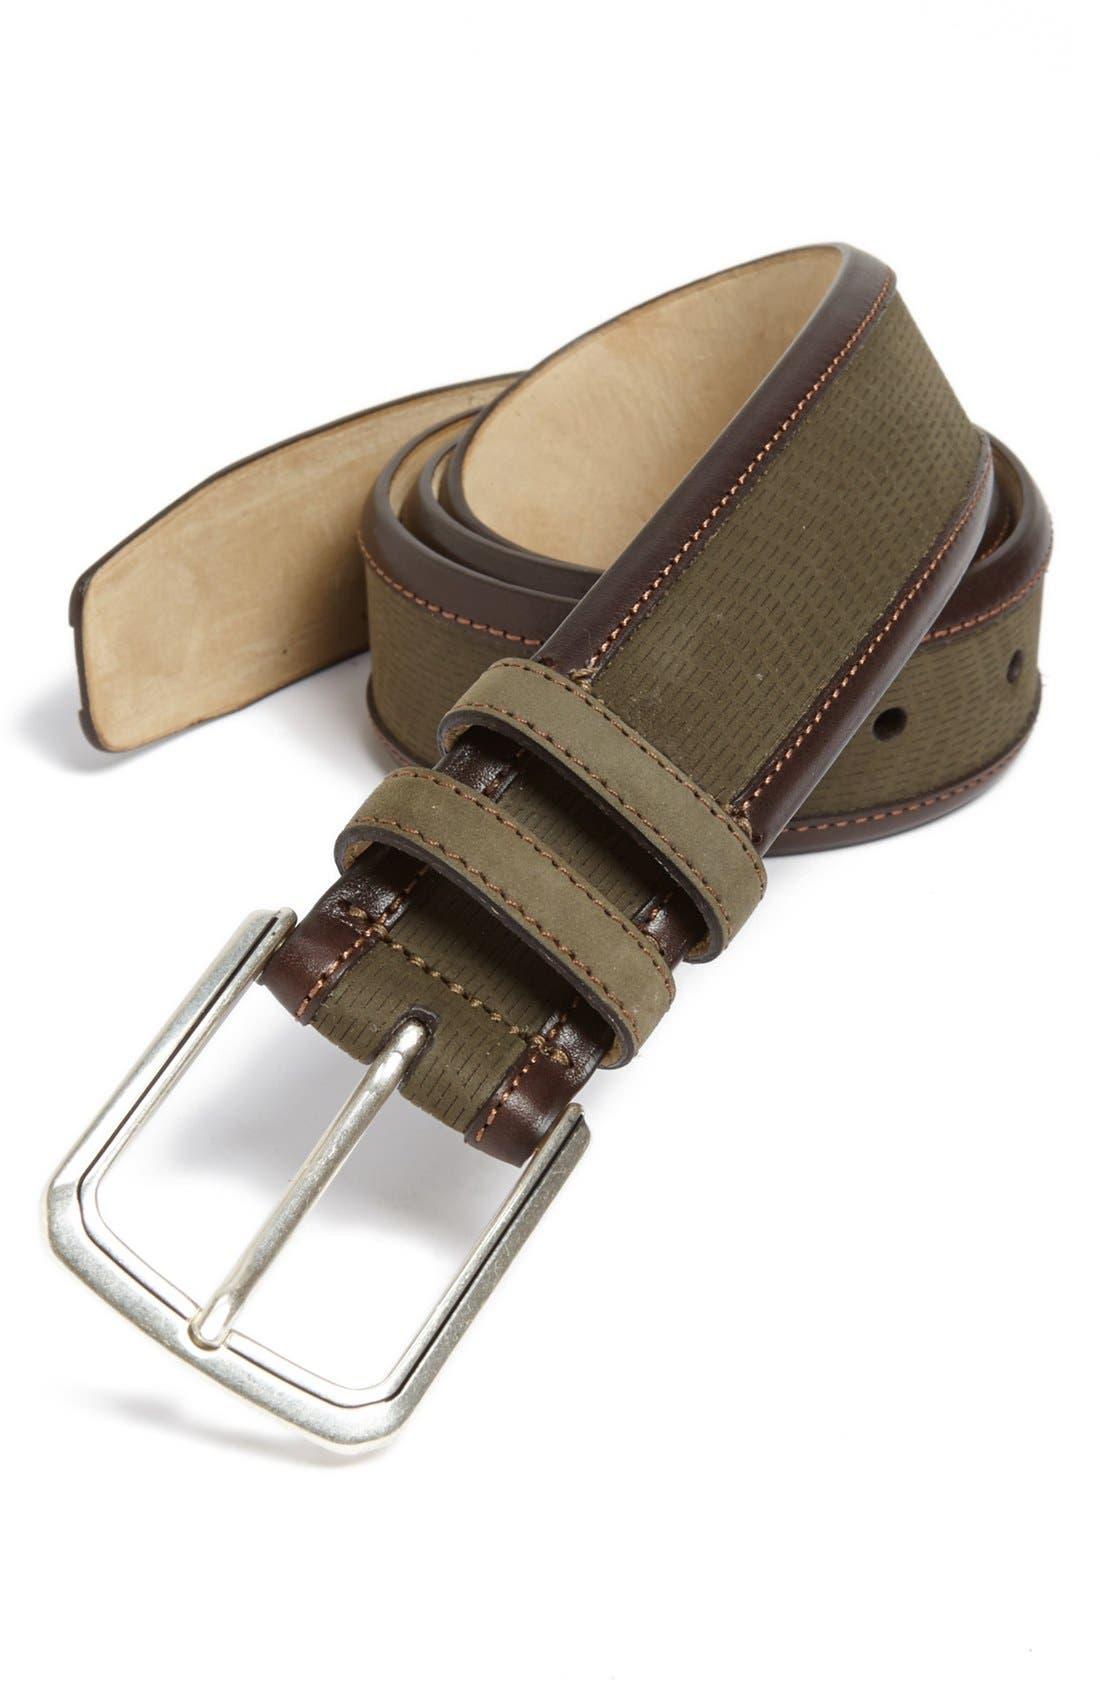 Main Image - Mezlan Nubuck Leather Belt